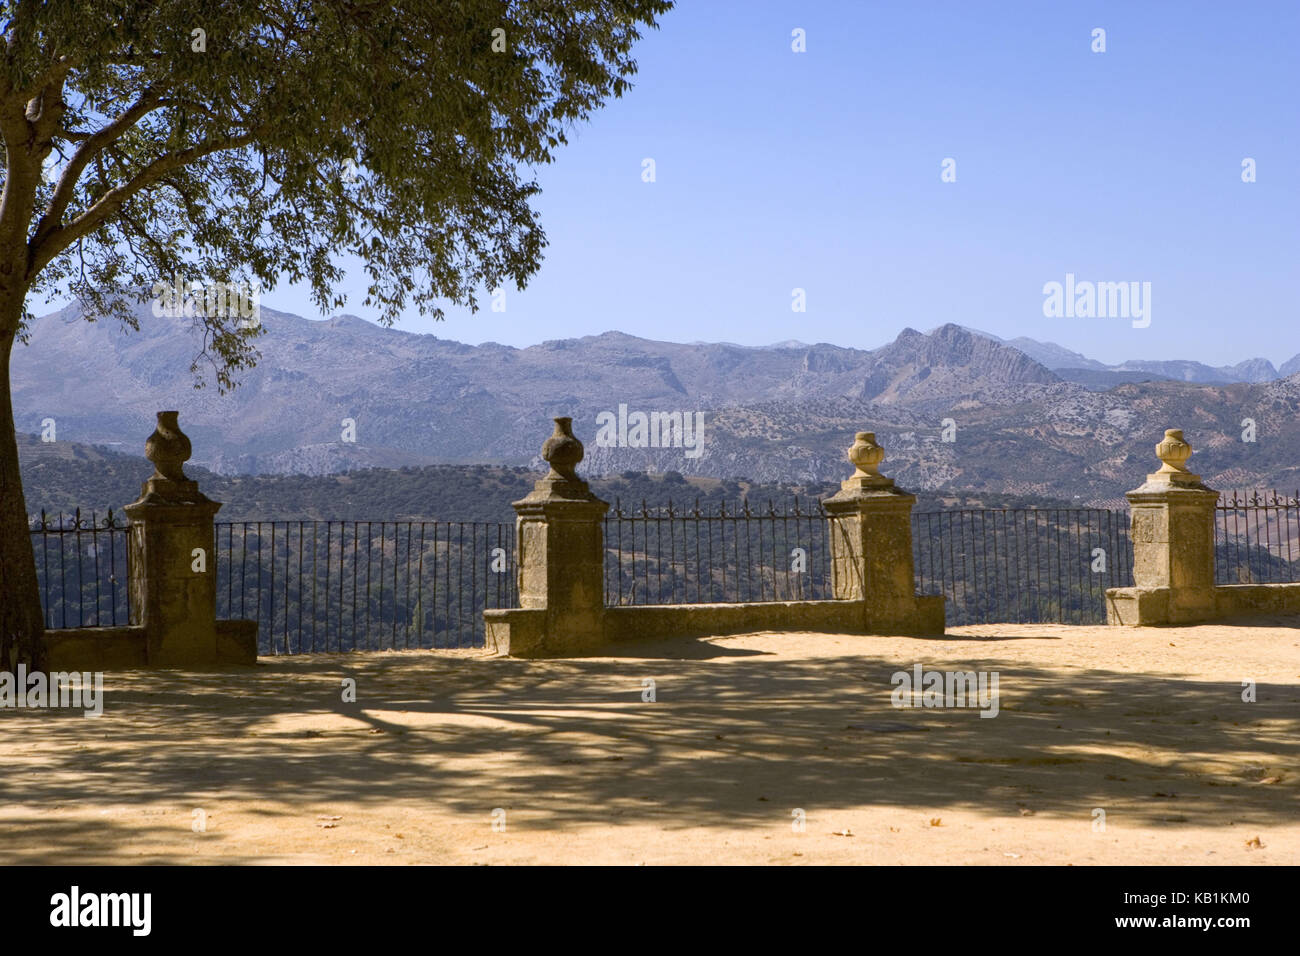 Spain, Ronda, historical small town, garden 'Jardines de Cuenca', view at the mountain landscape Serrania - Stock Image